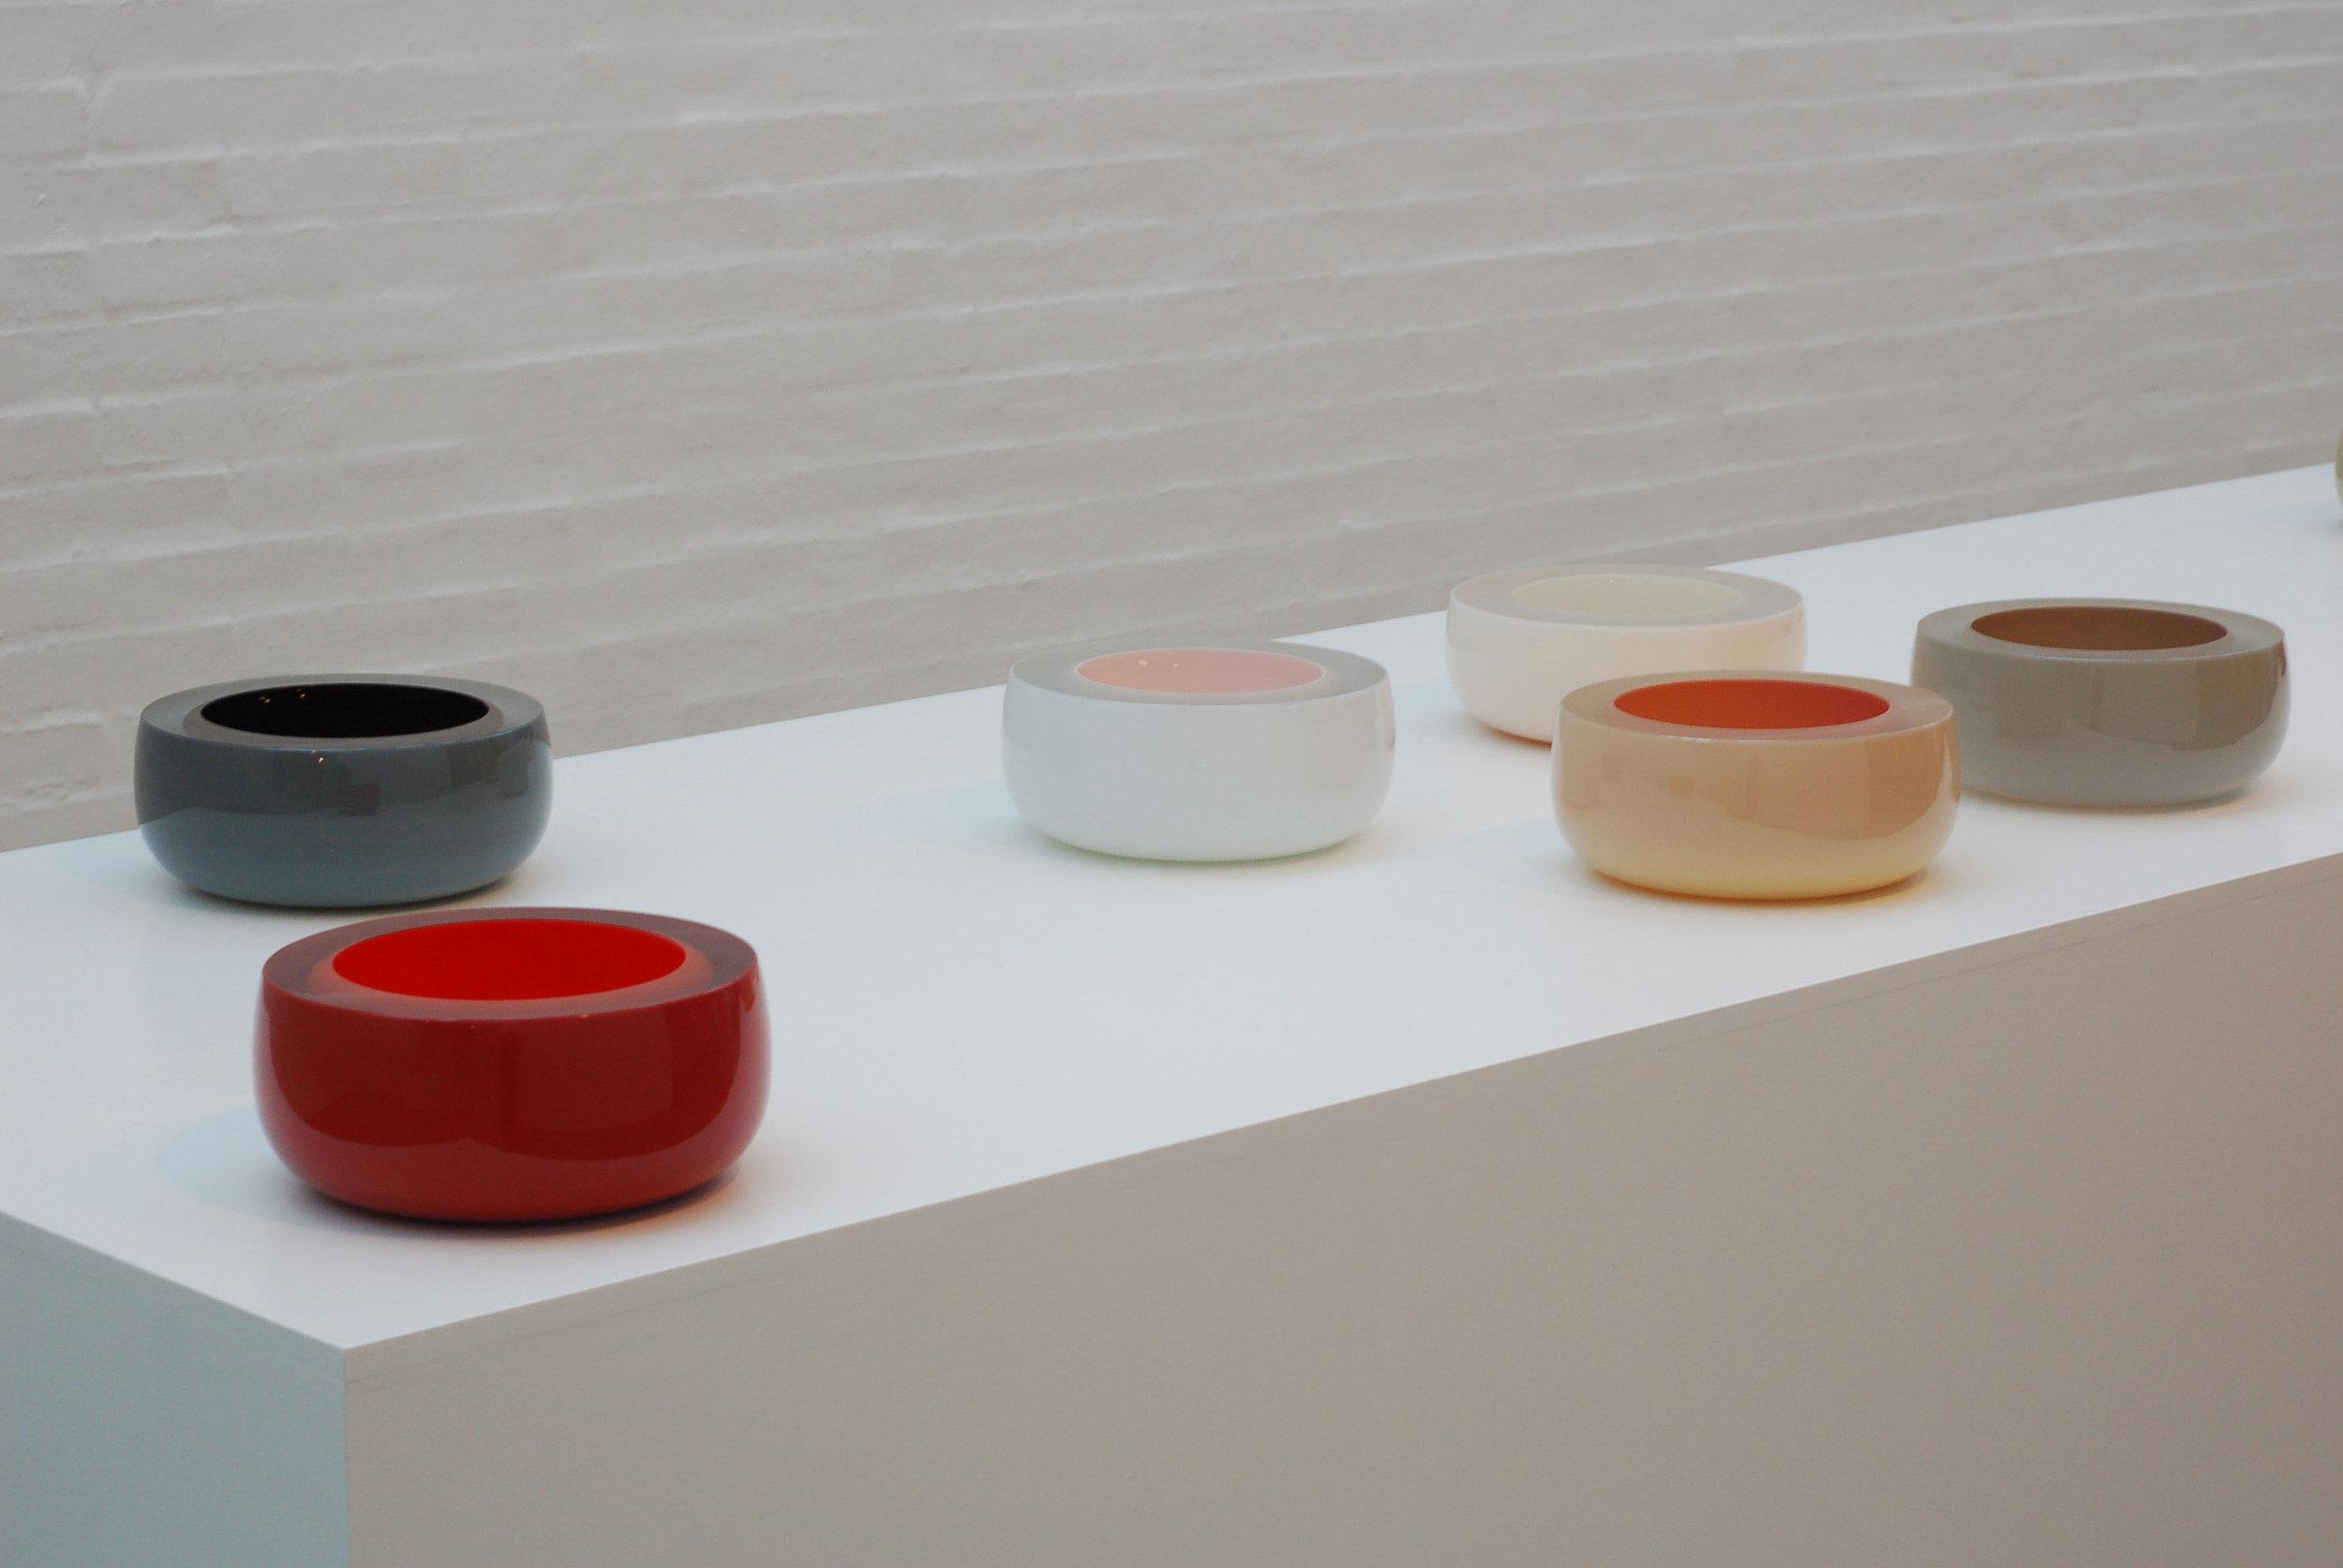 glass-bowls-exhibited-3-kopi.jpg